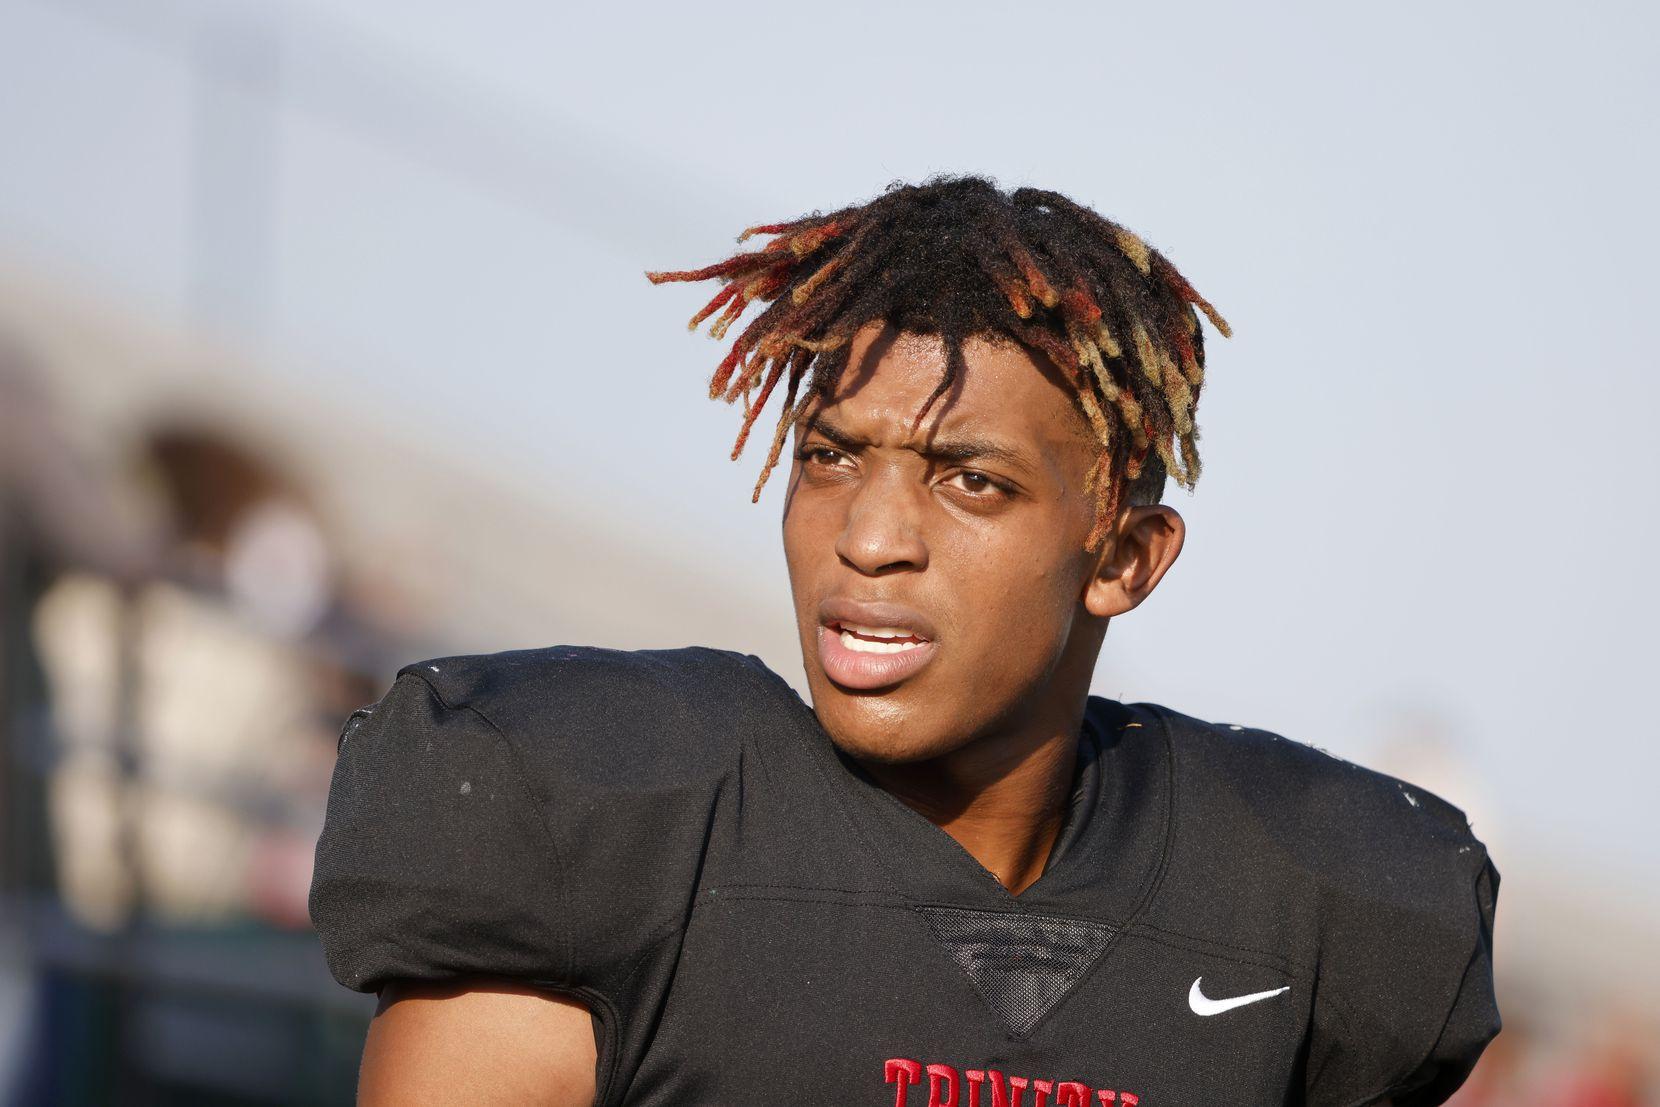 Arlington Lamar quarterback Ollie Gordon, prior to their high school football game in Bedford, Texas on Aug. 26, 2021. (Michael Ainsworth/Special Contributor)